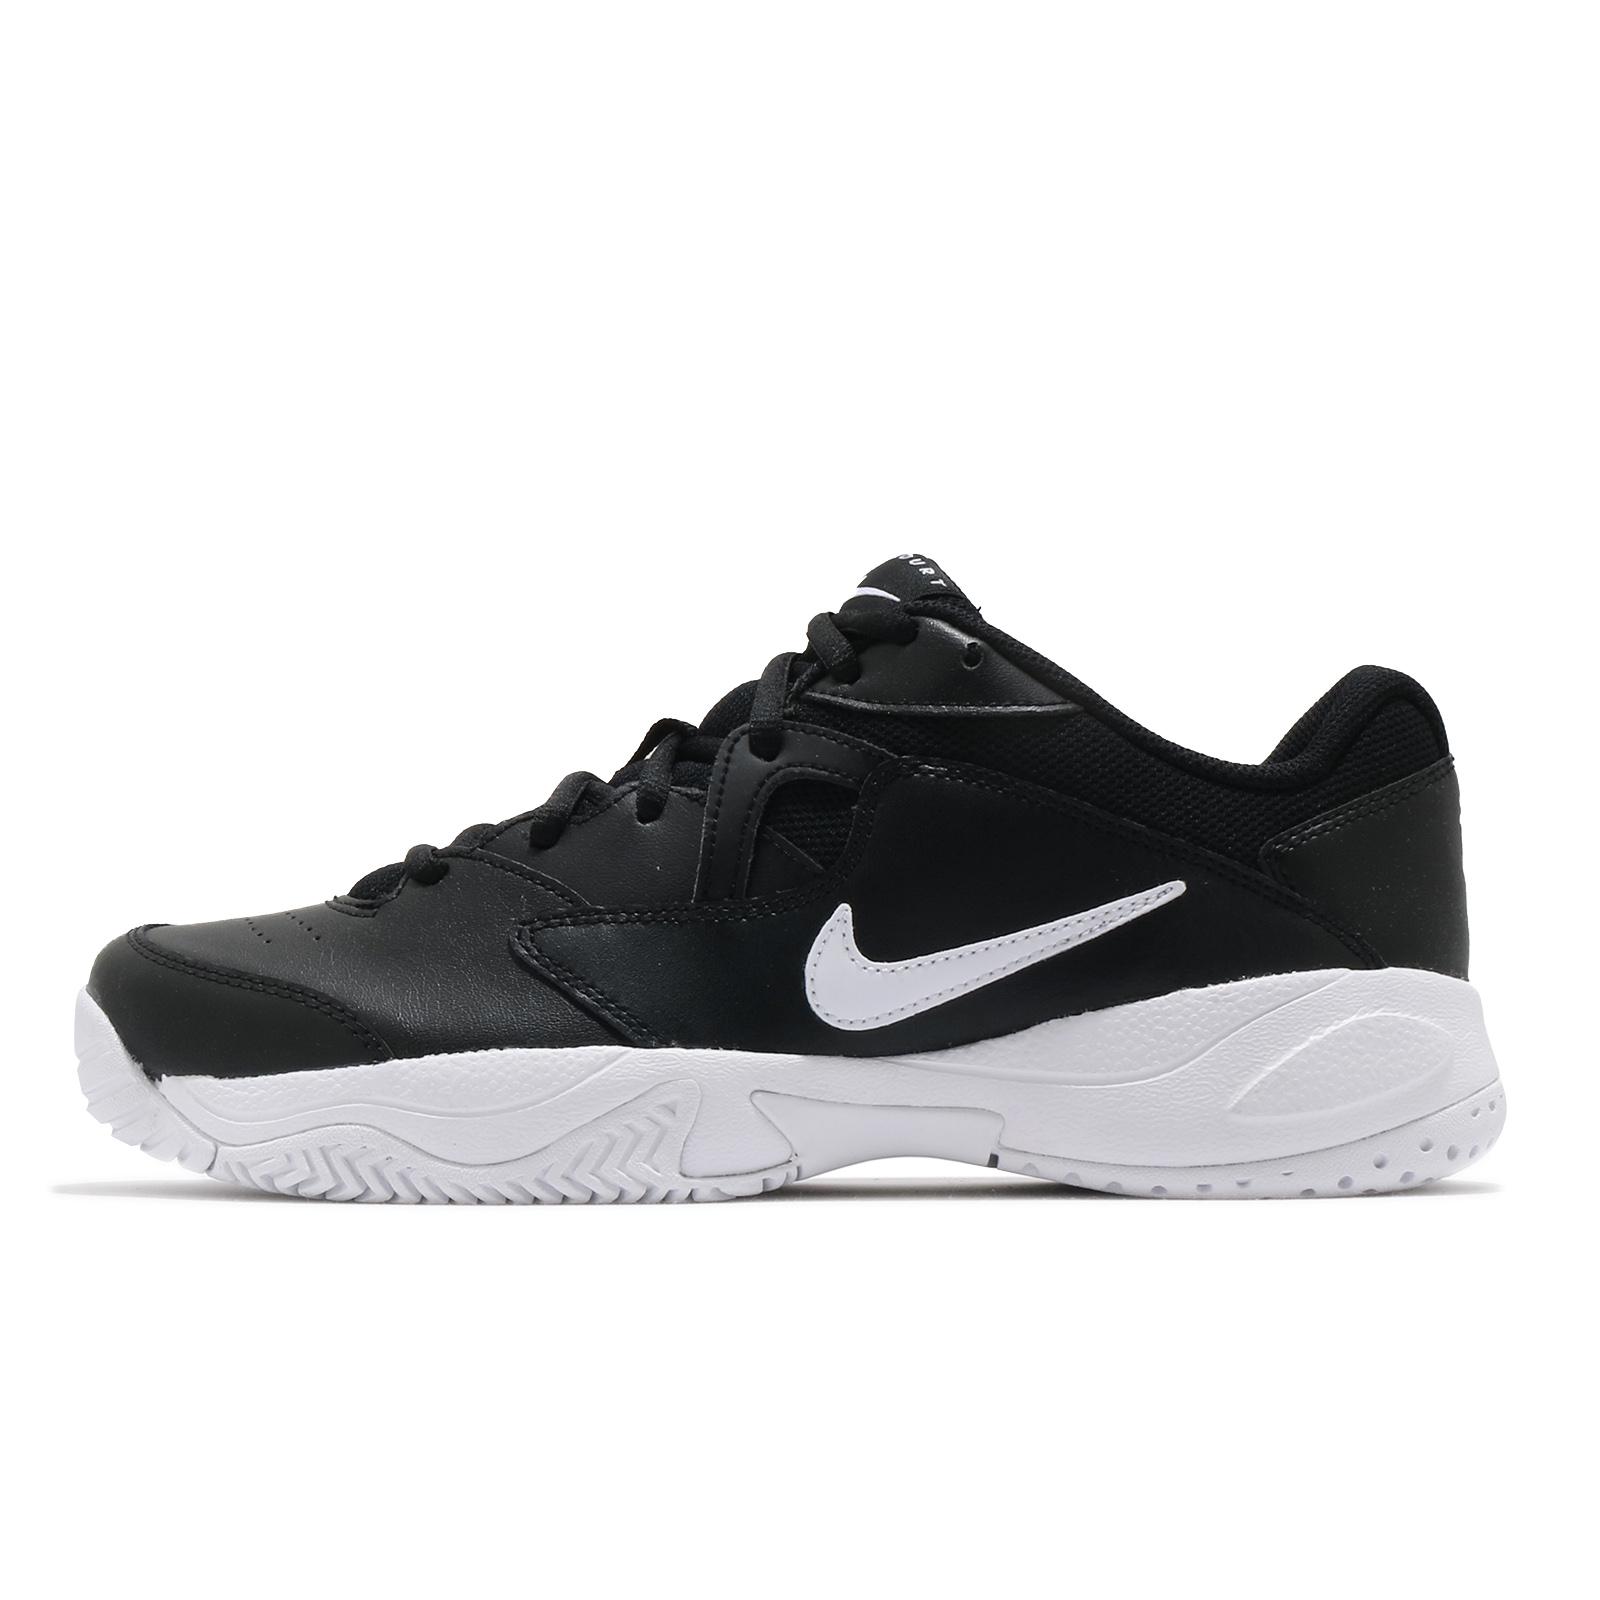 Nike 網球鞋 Court Lite 2 黑 白 基本款 硬地球場 男鞋 運動鞋【ACS】 AR8836-005